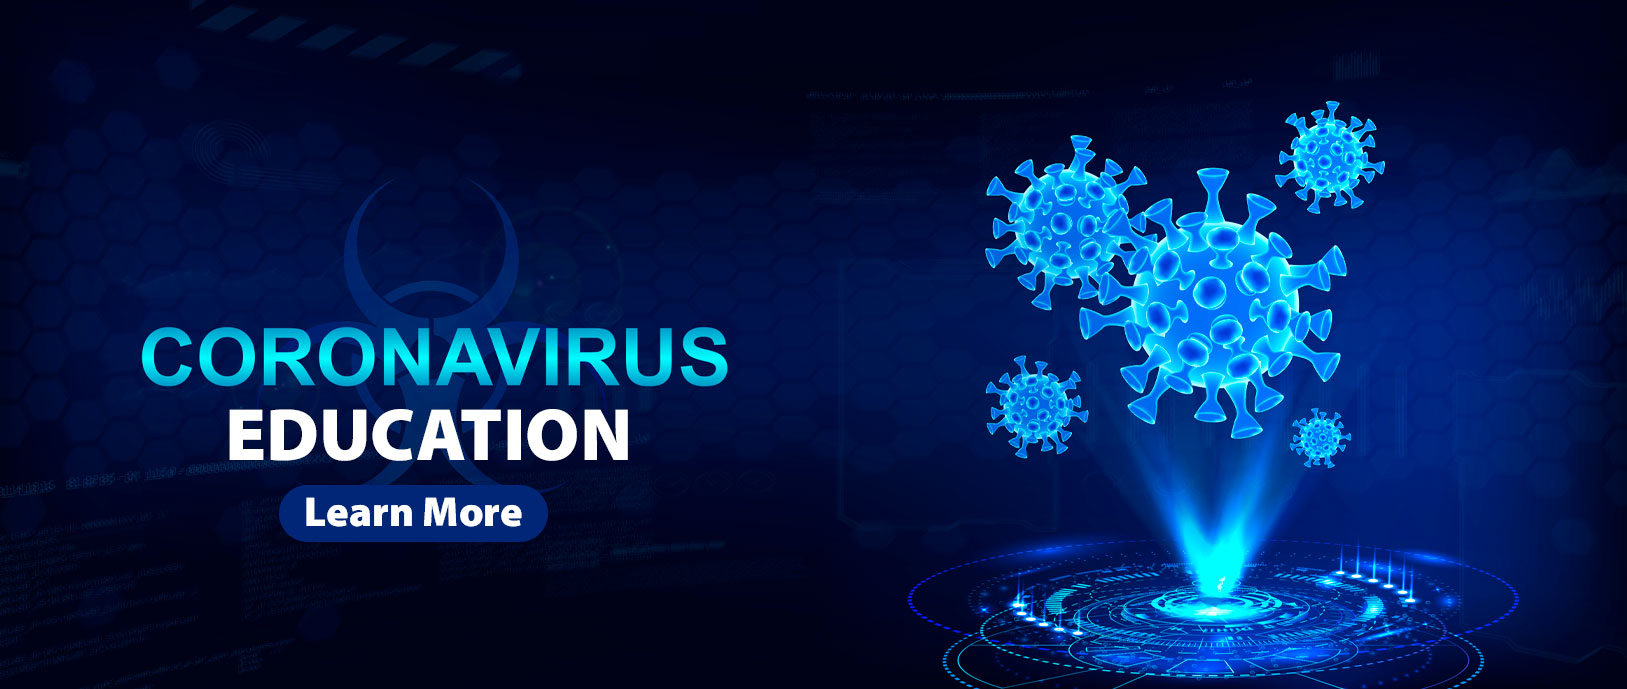 Coronavirus Education Learn More